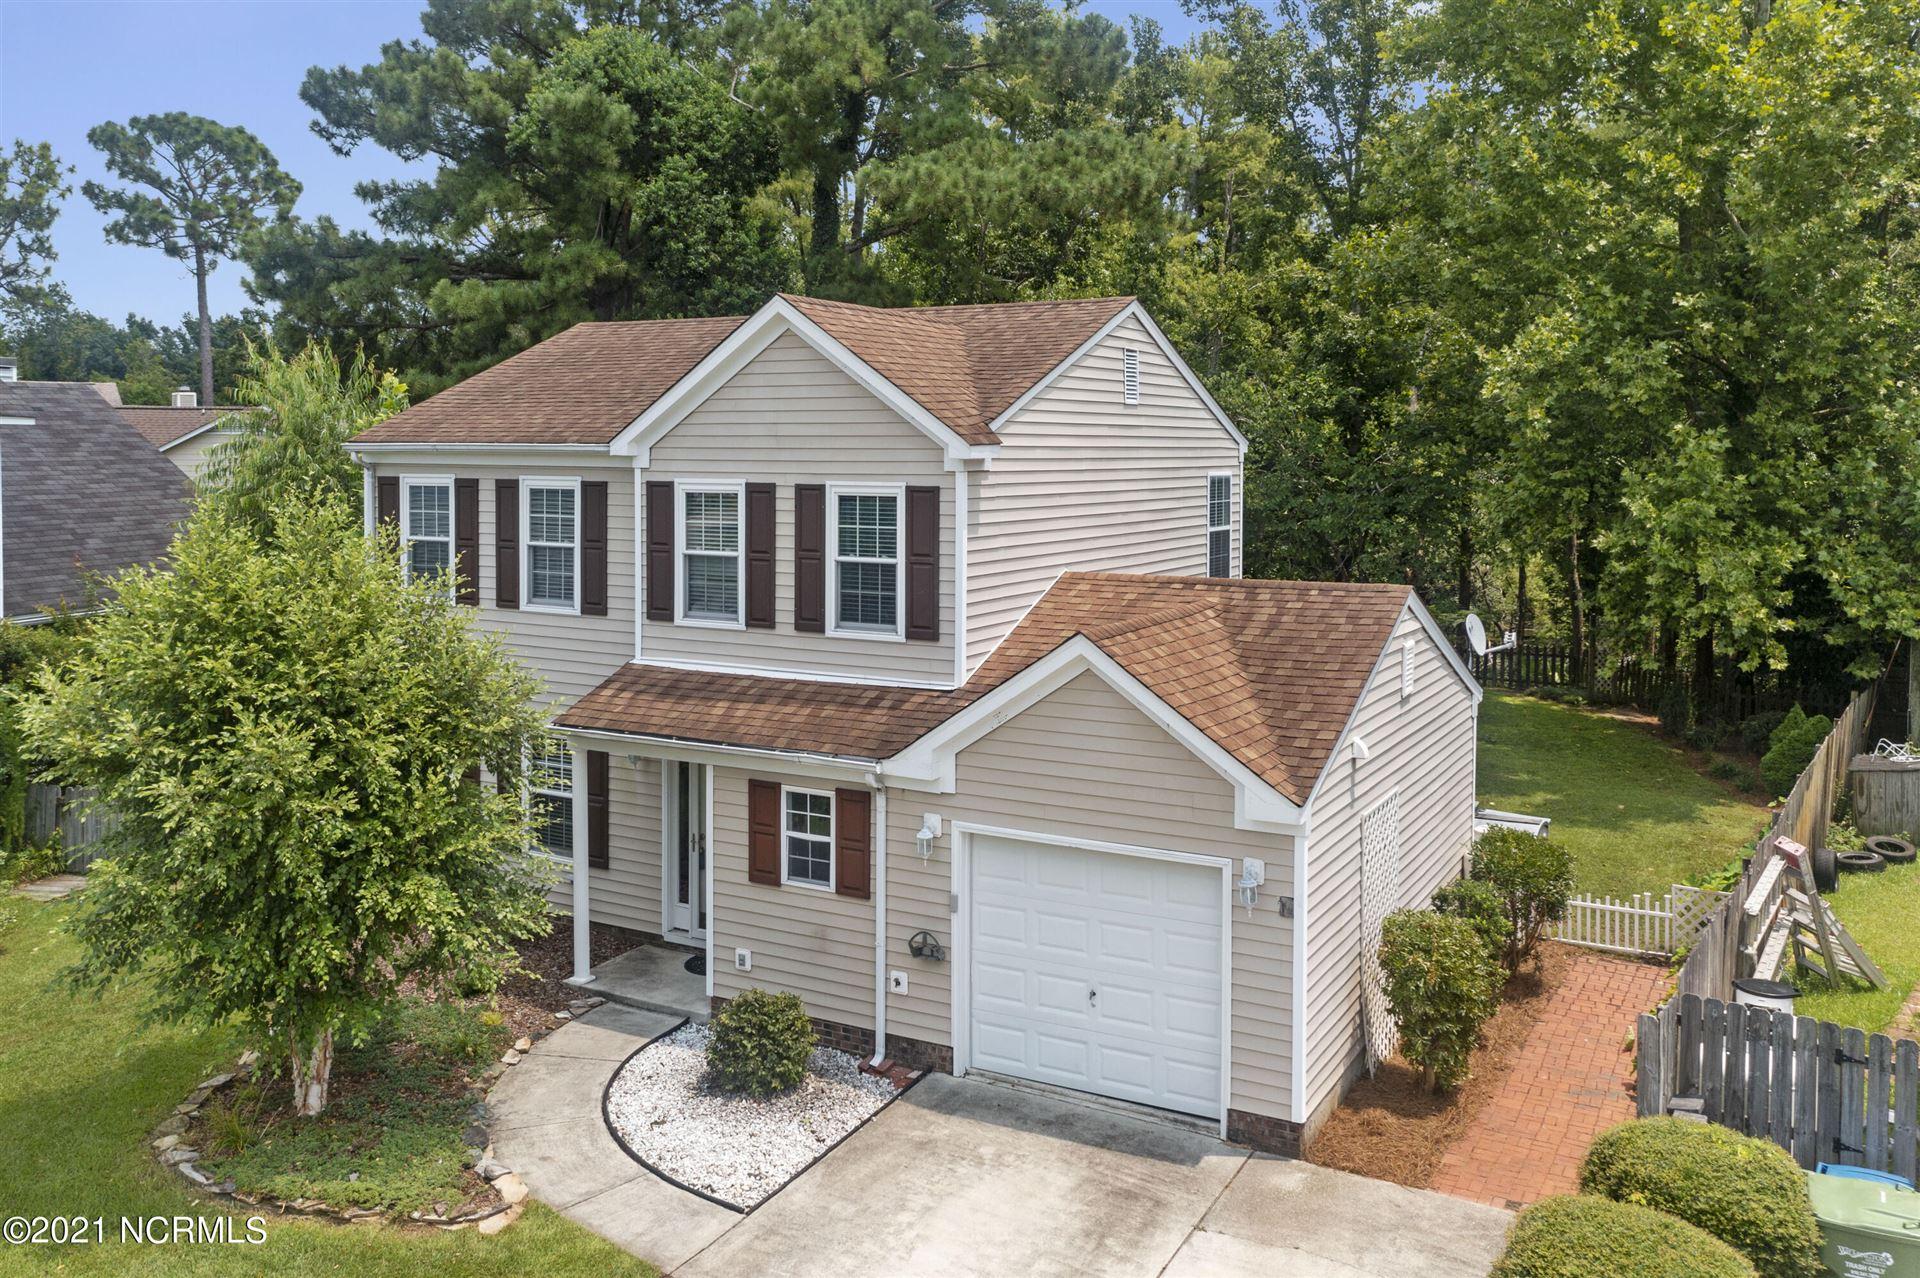 Photo for 4149 Abbington Terrace, Wilmington, NC 28403 (MLS # 100282325)